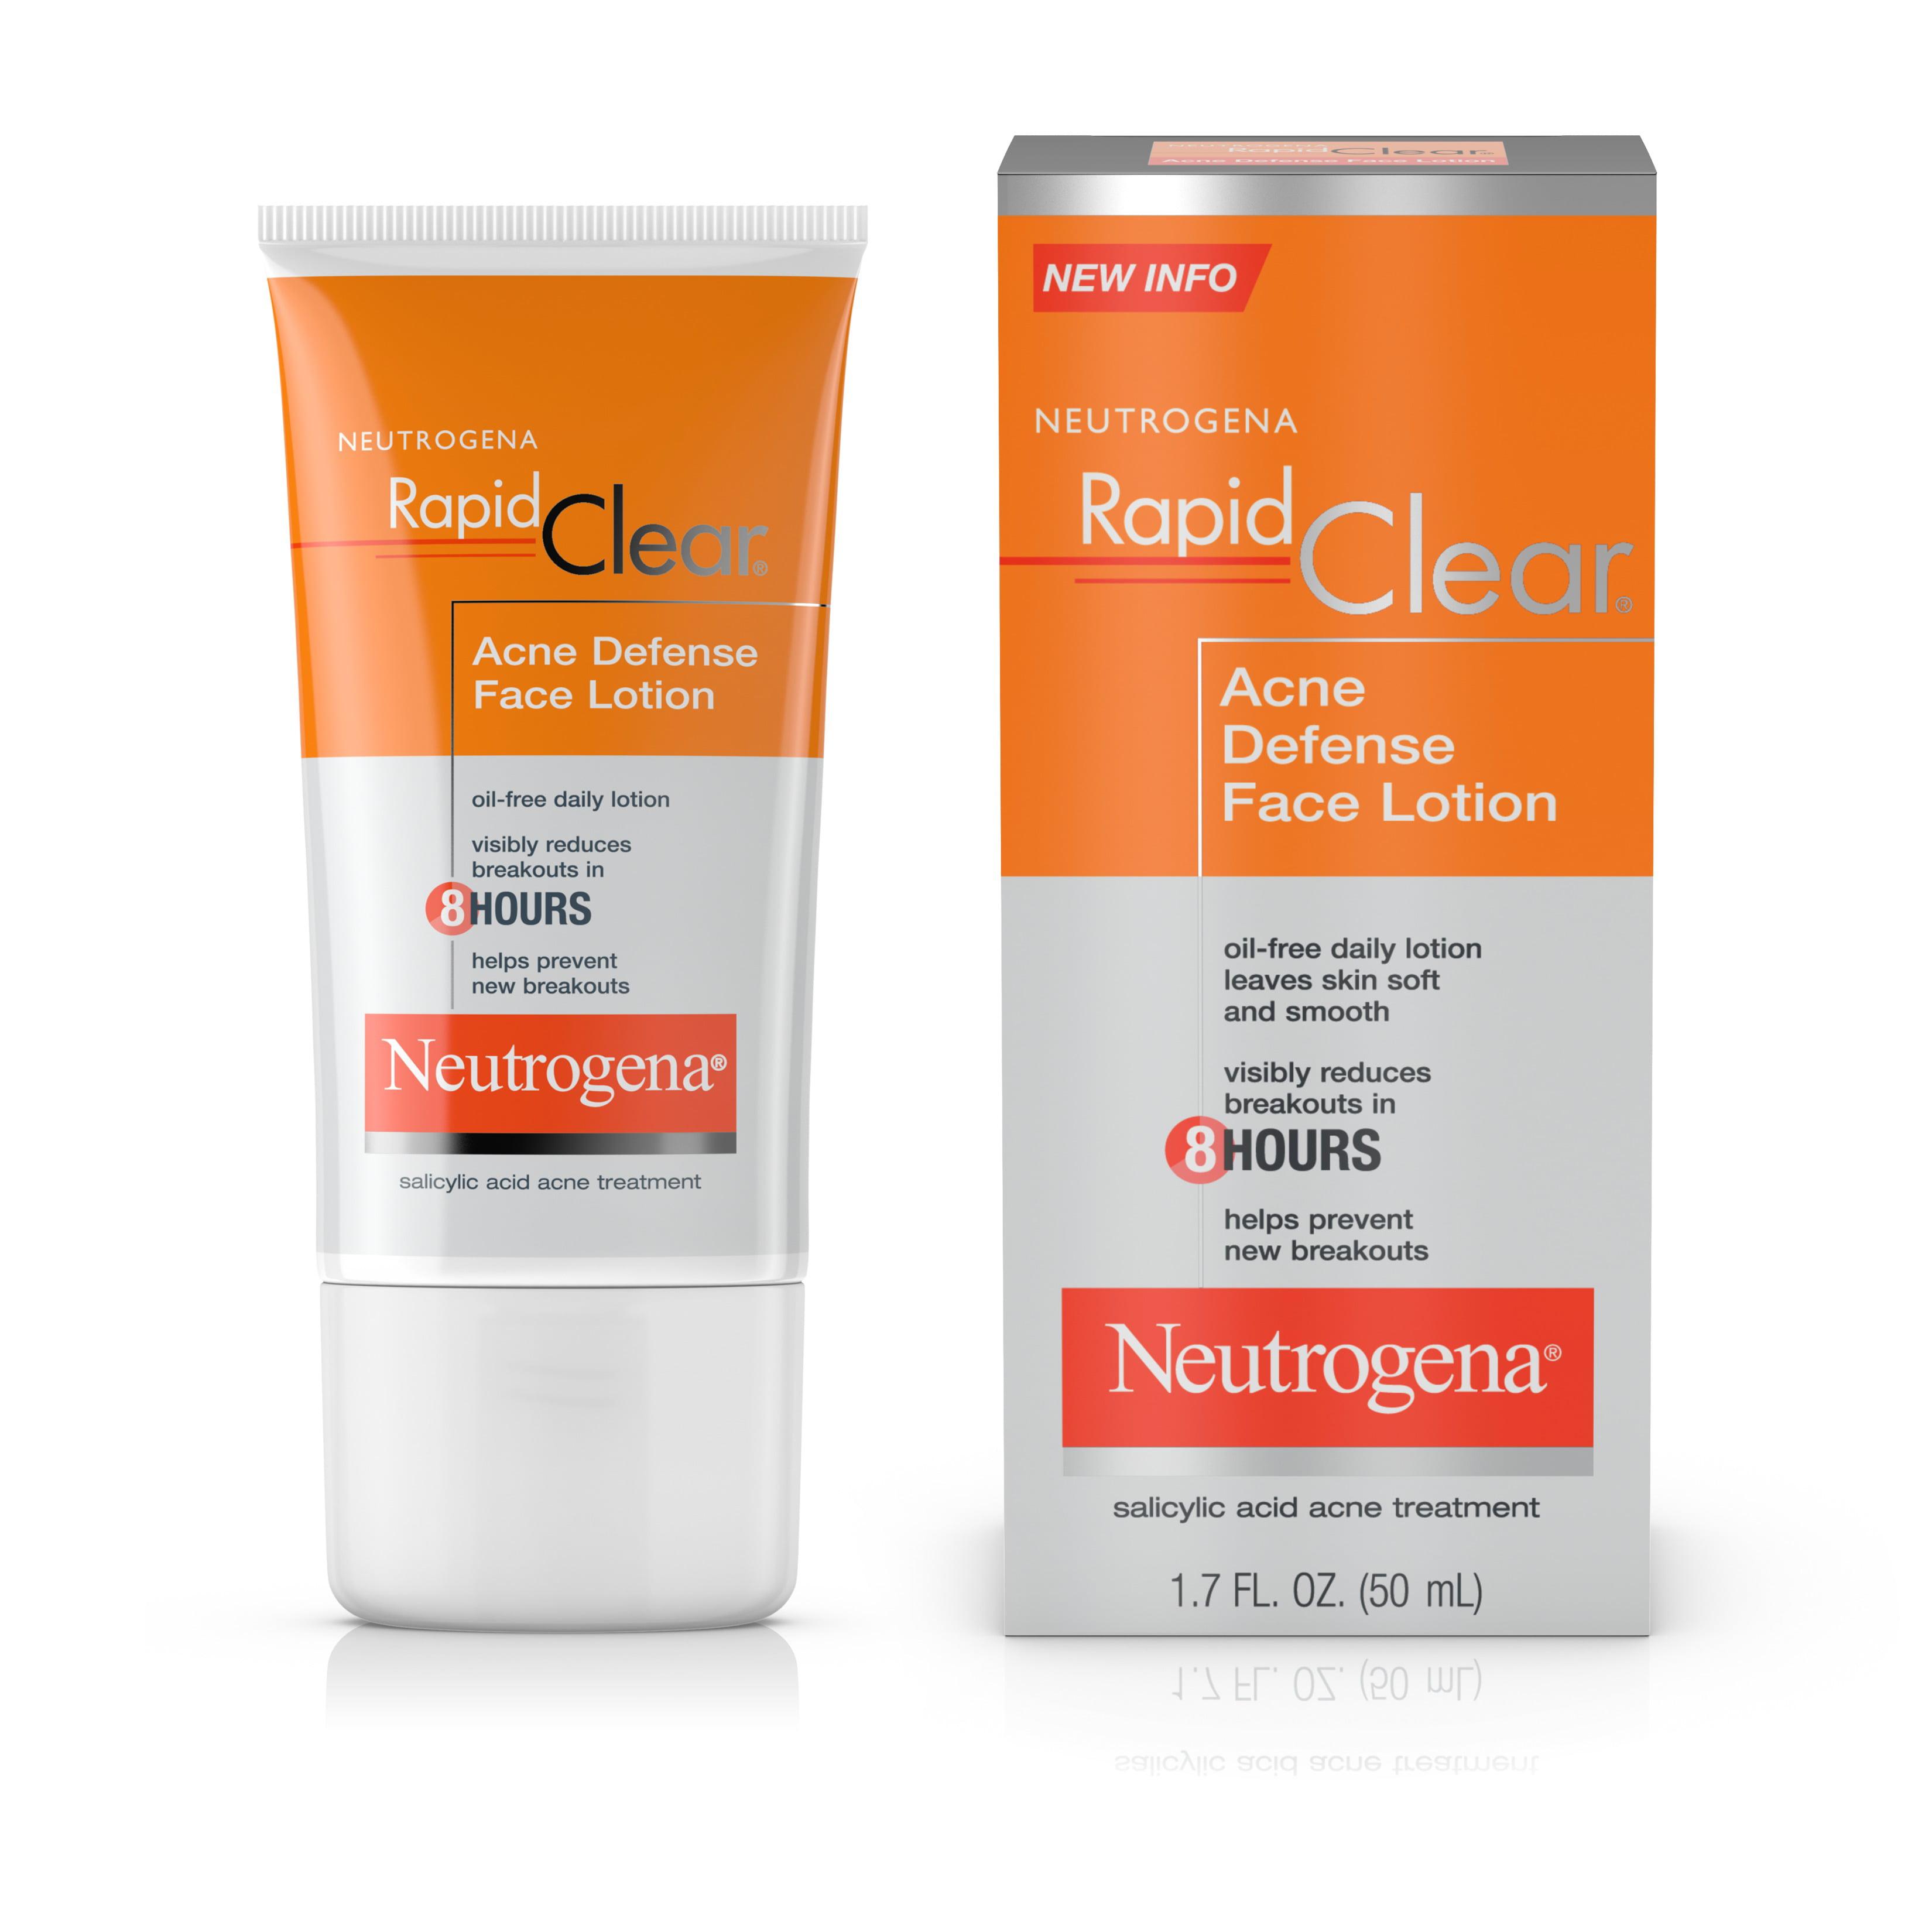 Neutrogena Rapid Clear Acne Defense Face Lotion, 1.7 fl. oz